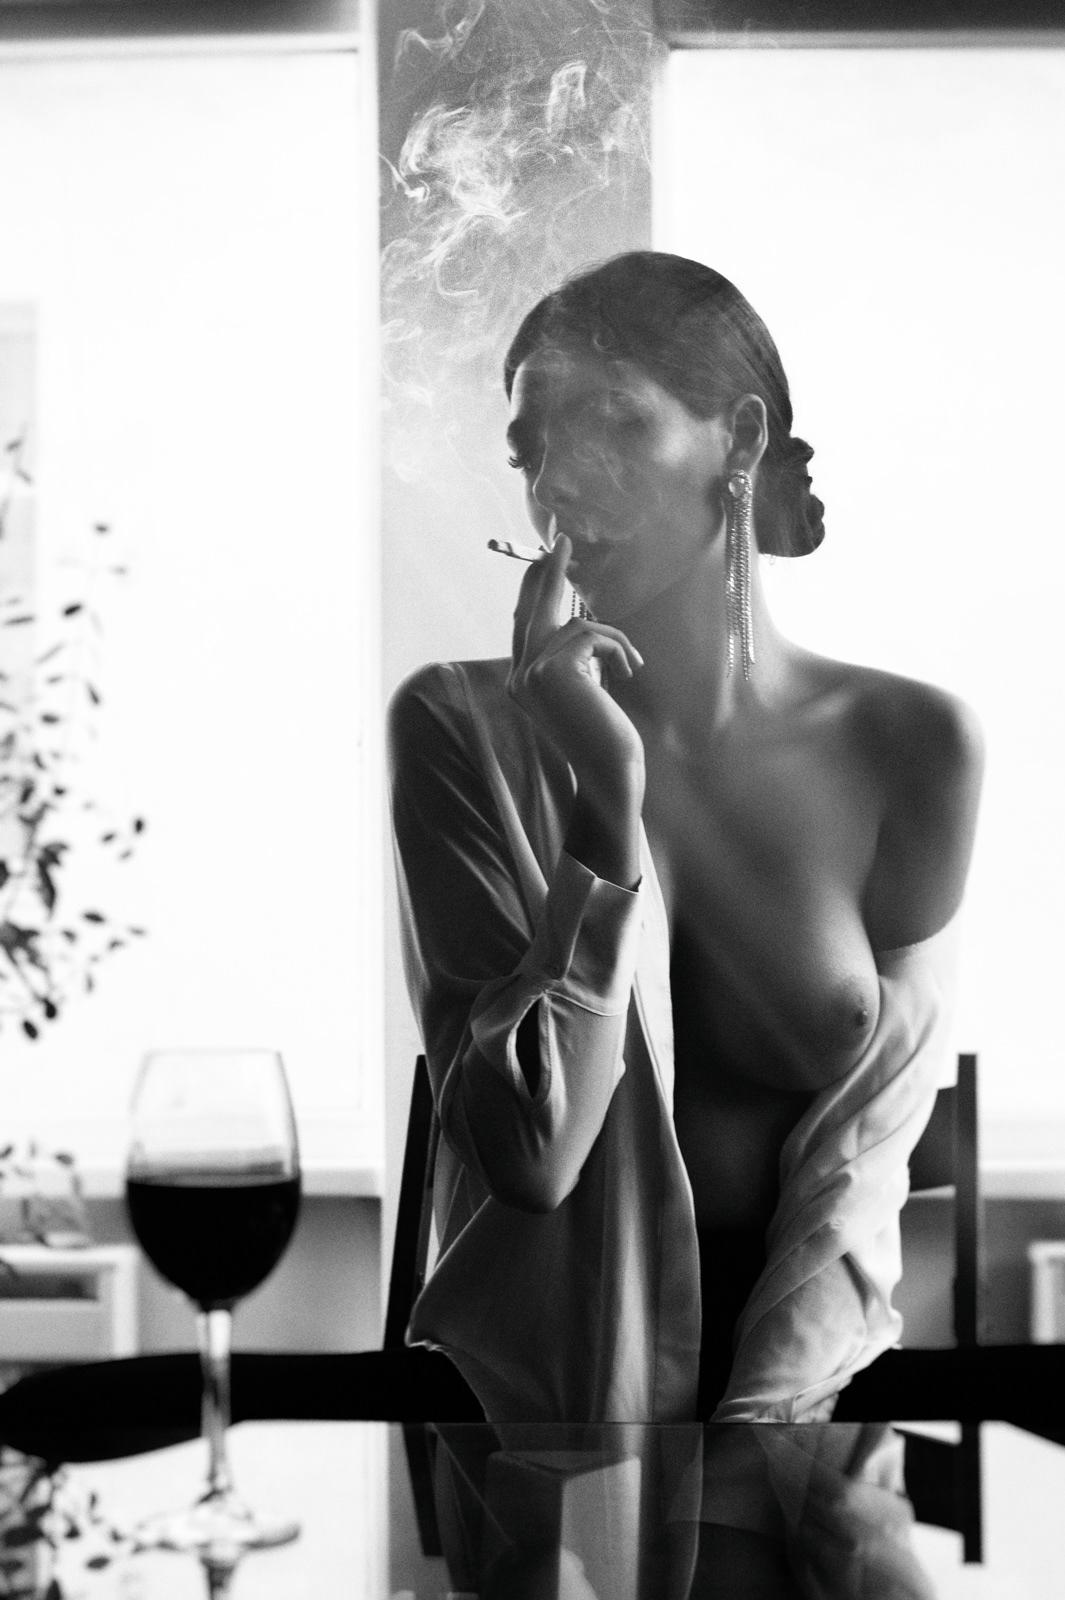 Карина пьет вино / фотограф Владислав Спивак